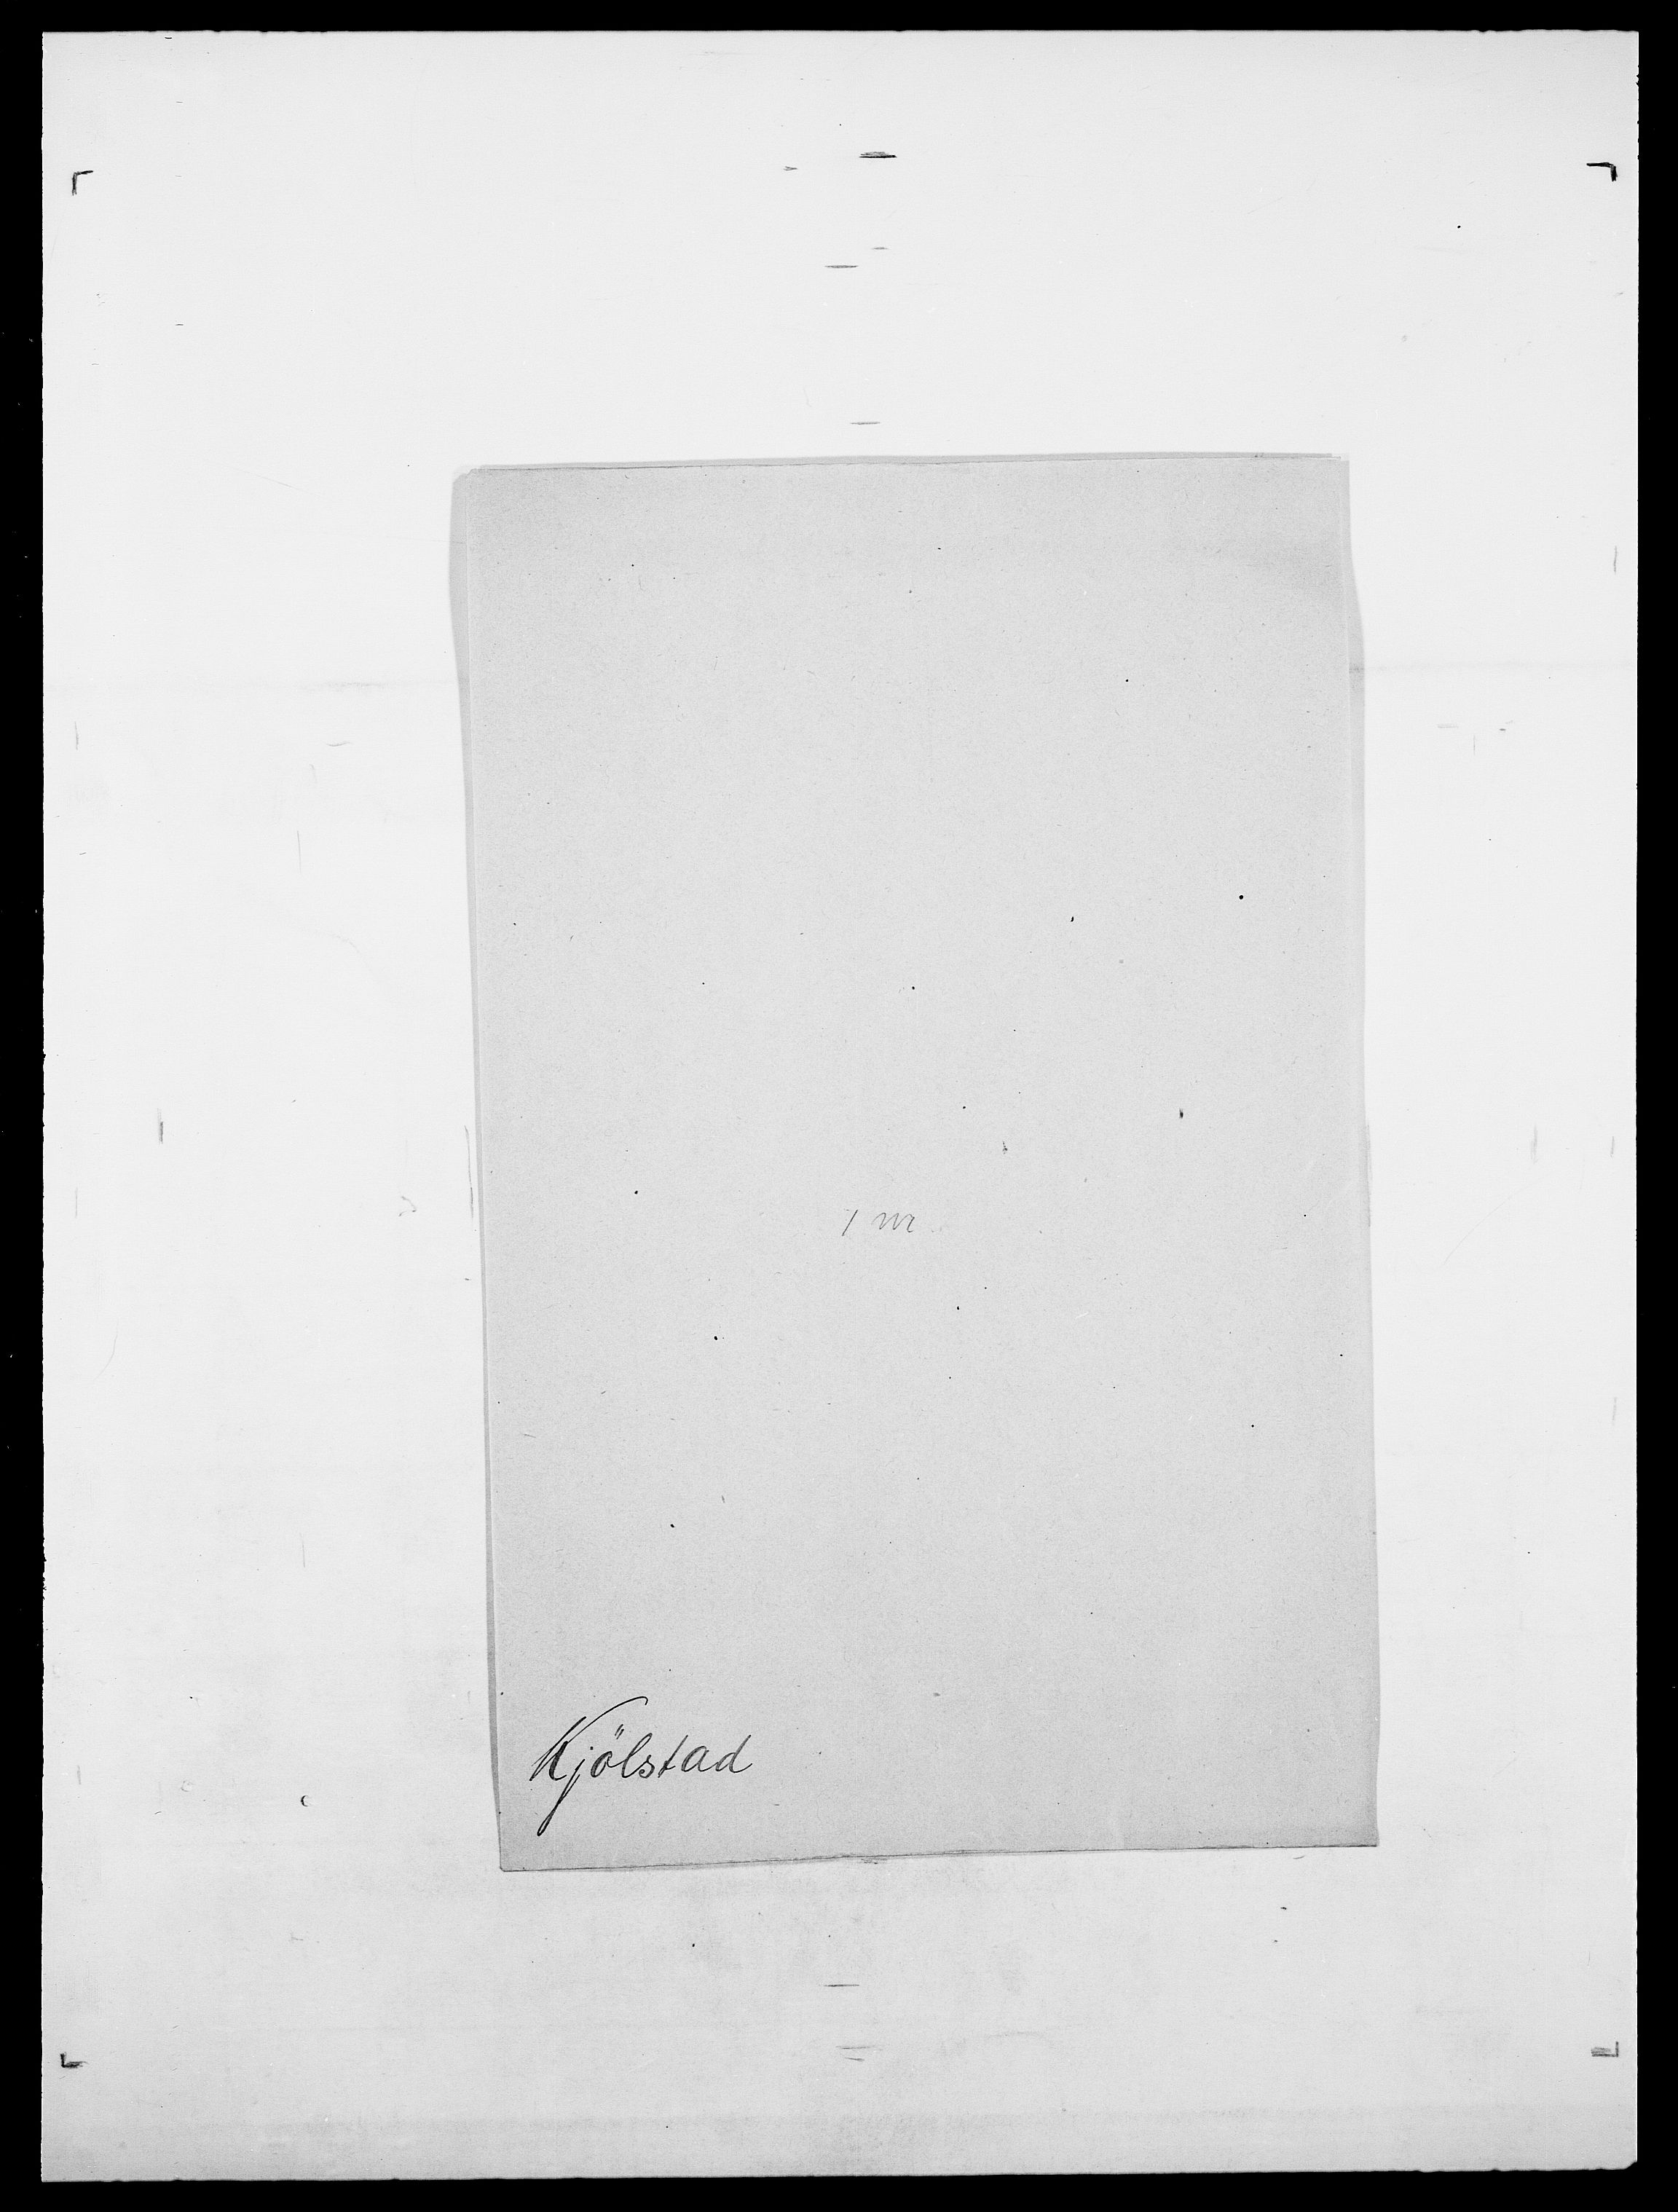 SAO, Delgobe, Charles Antoine - samling, D/Da/L0020: Irgens - Kjøsterud, s. 831